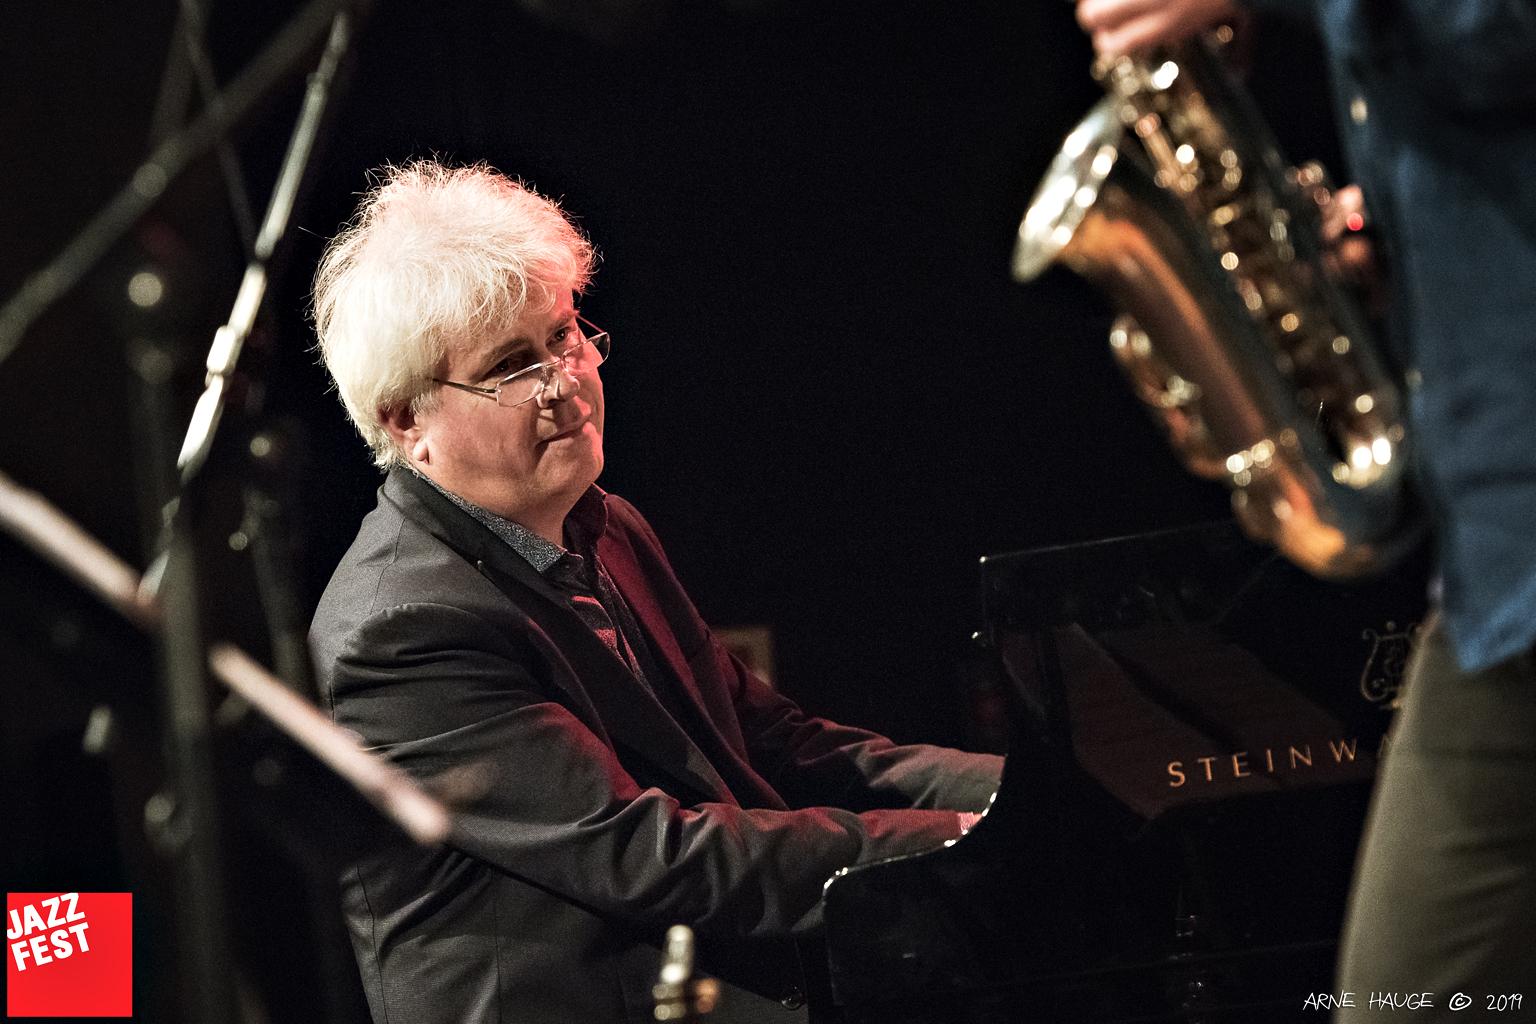 190509 Hegge (Jazz Expo) @ Dokkhuset - foto Arne Hauge_002.jpg